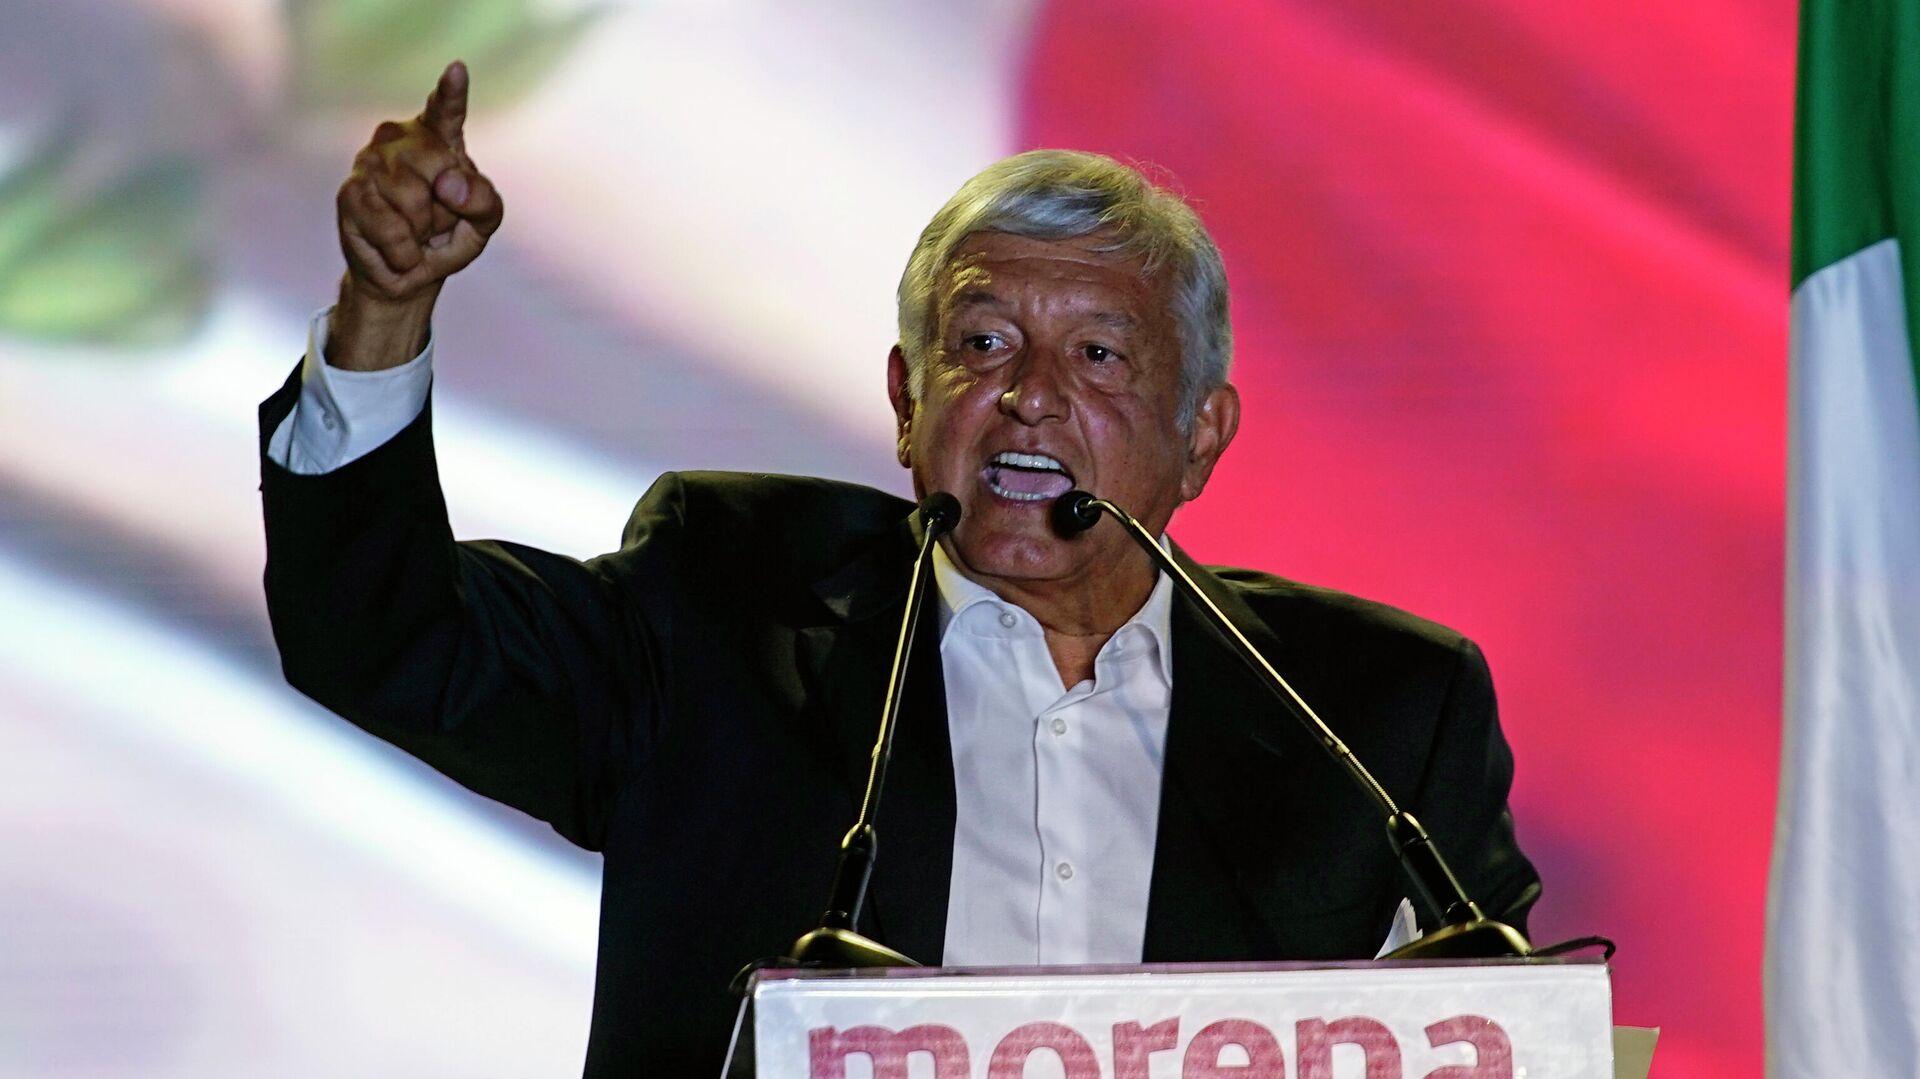 El presidente de México, Andrés Manuel López Obrador - Sputnik Mundo, 1920, 09.08.2021